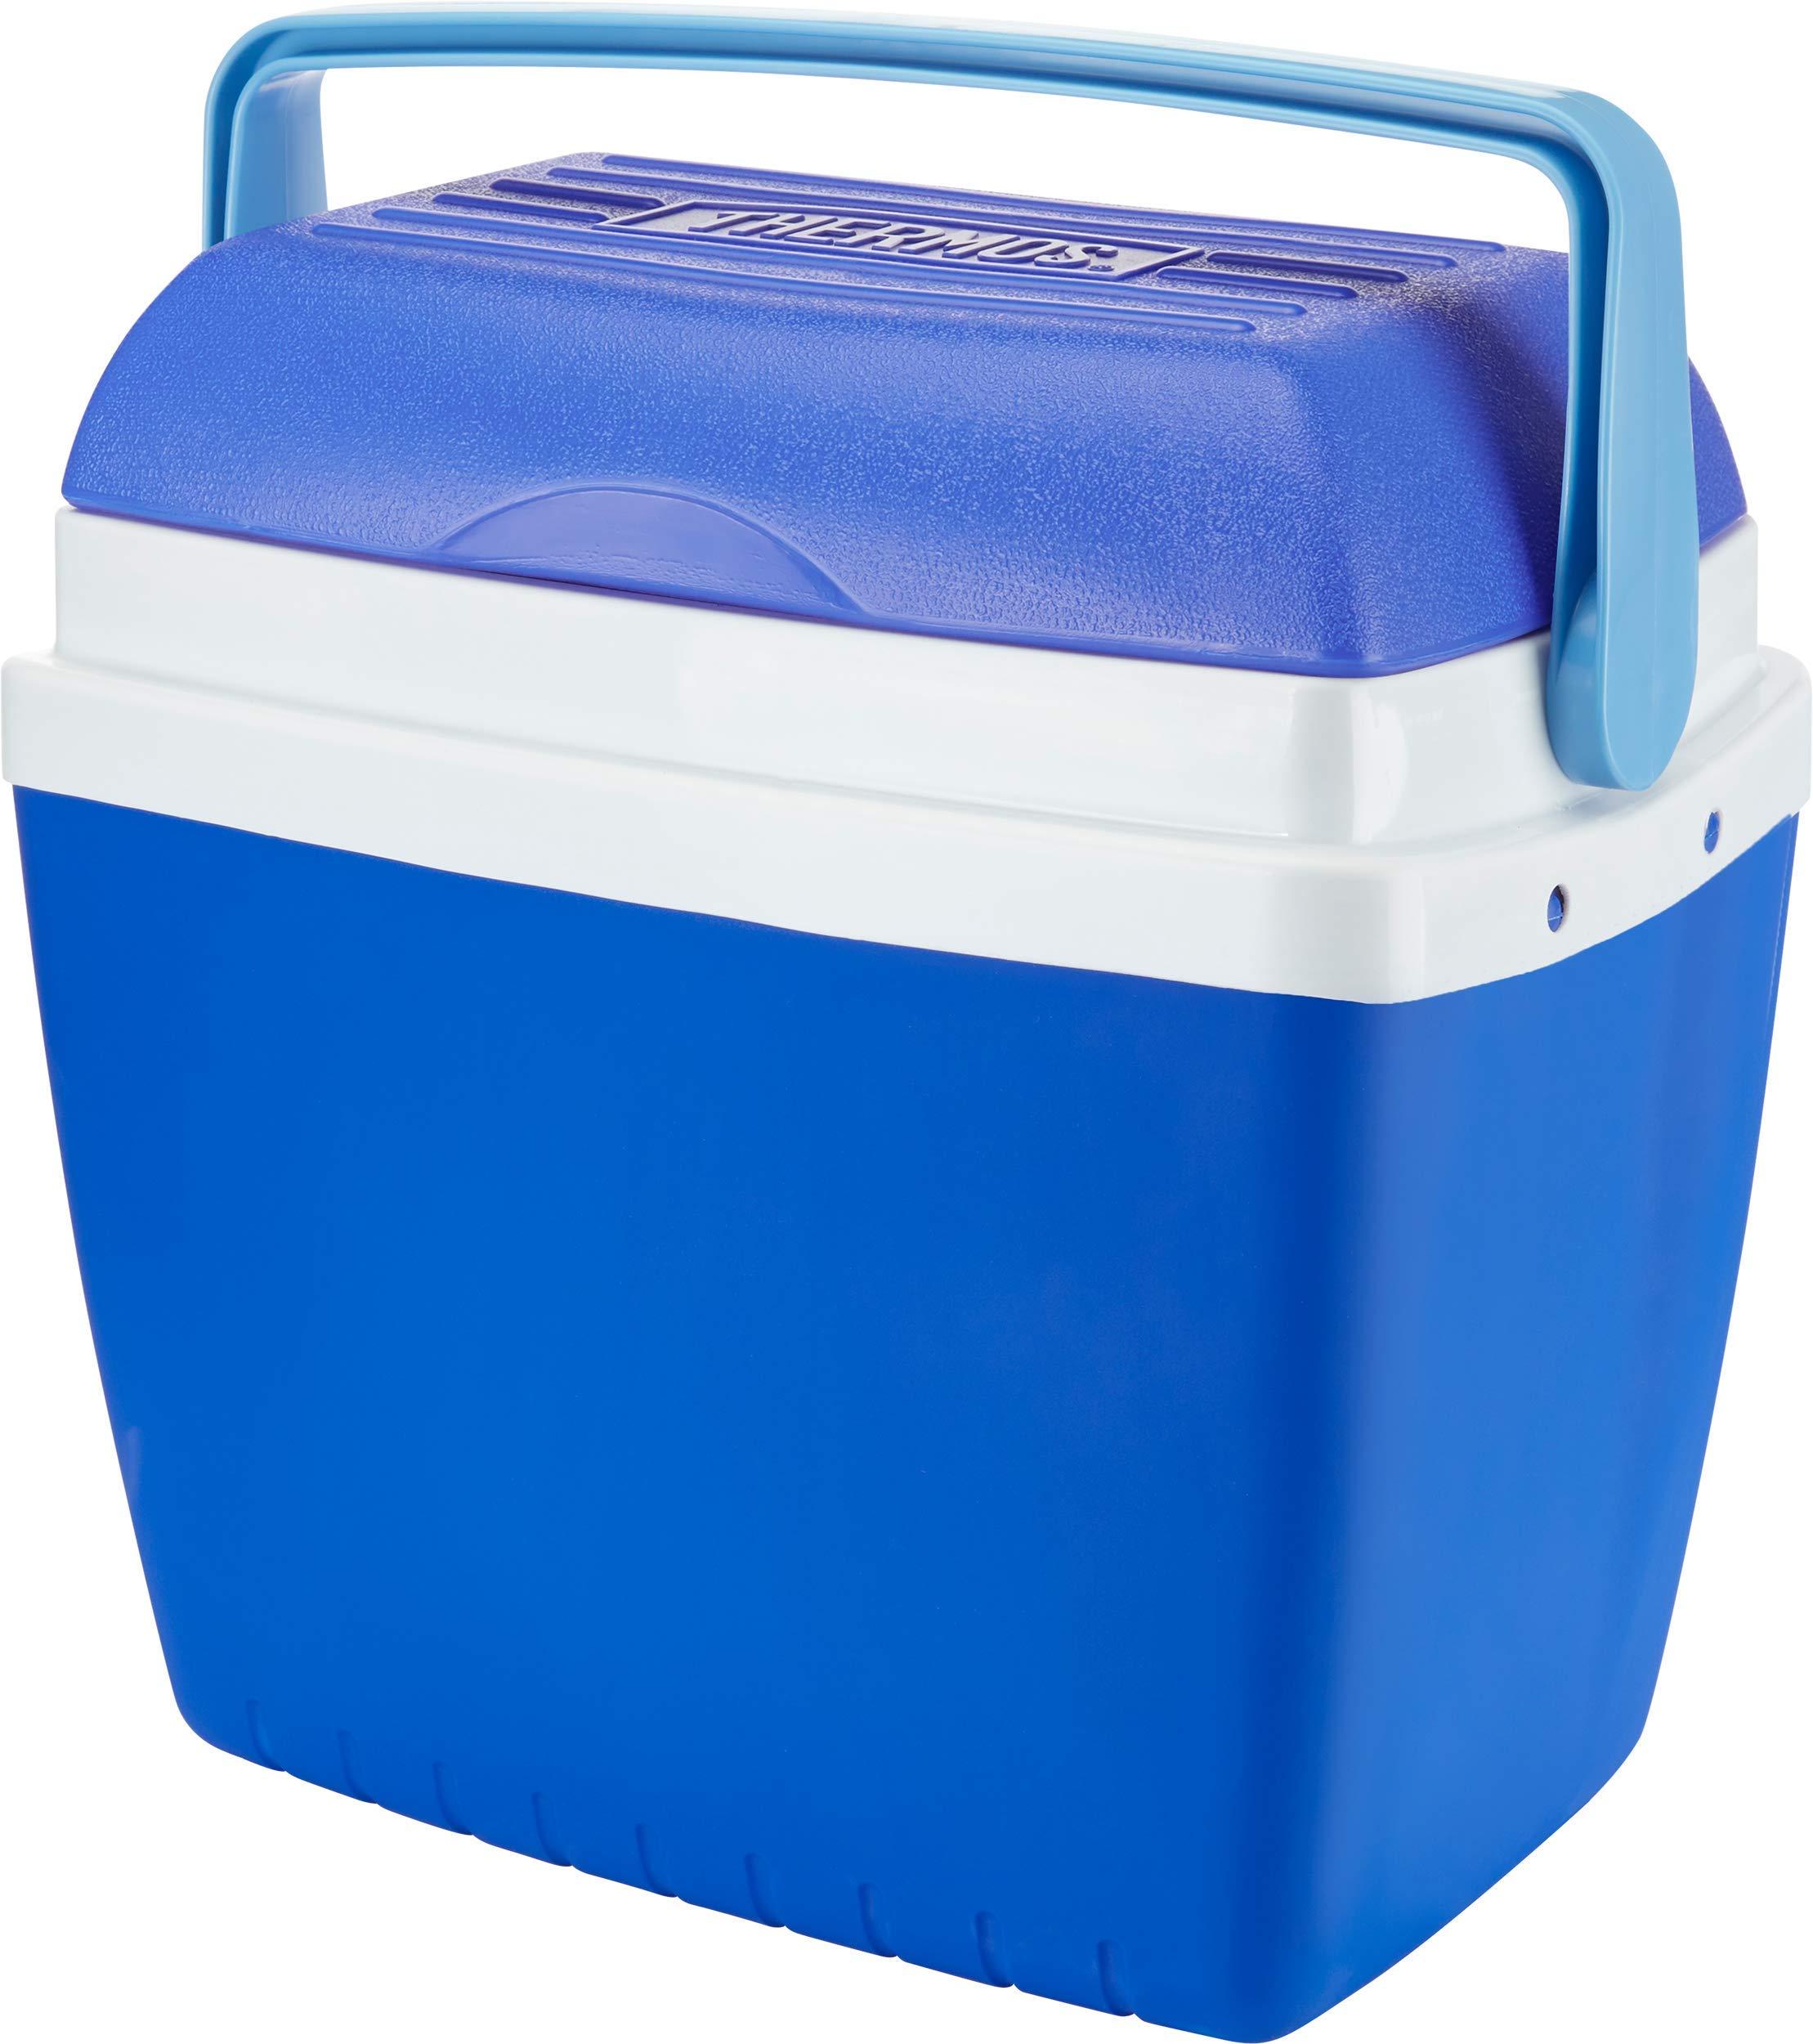 Thermos Cool Box - 32 L, Sky Blue